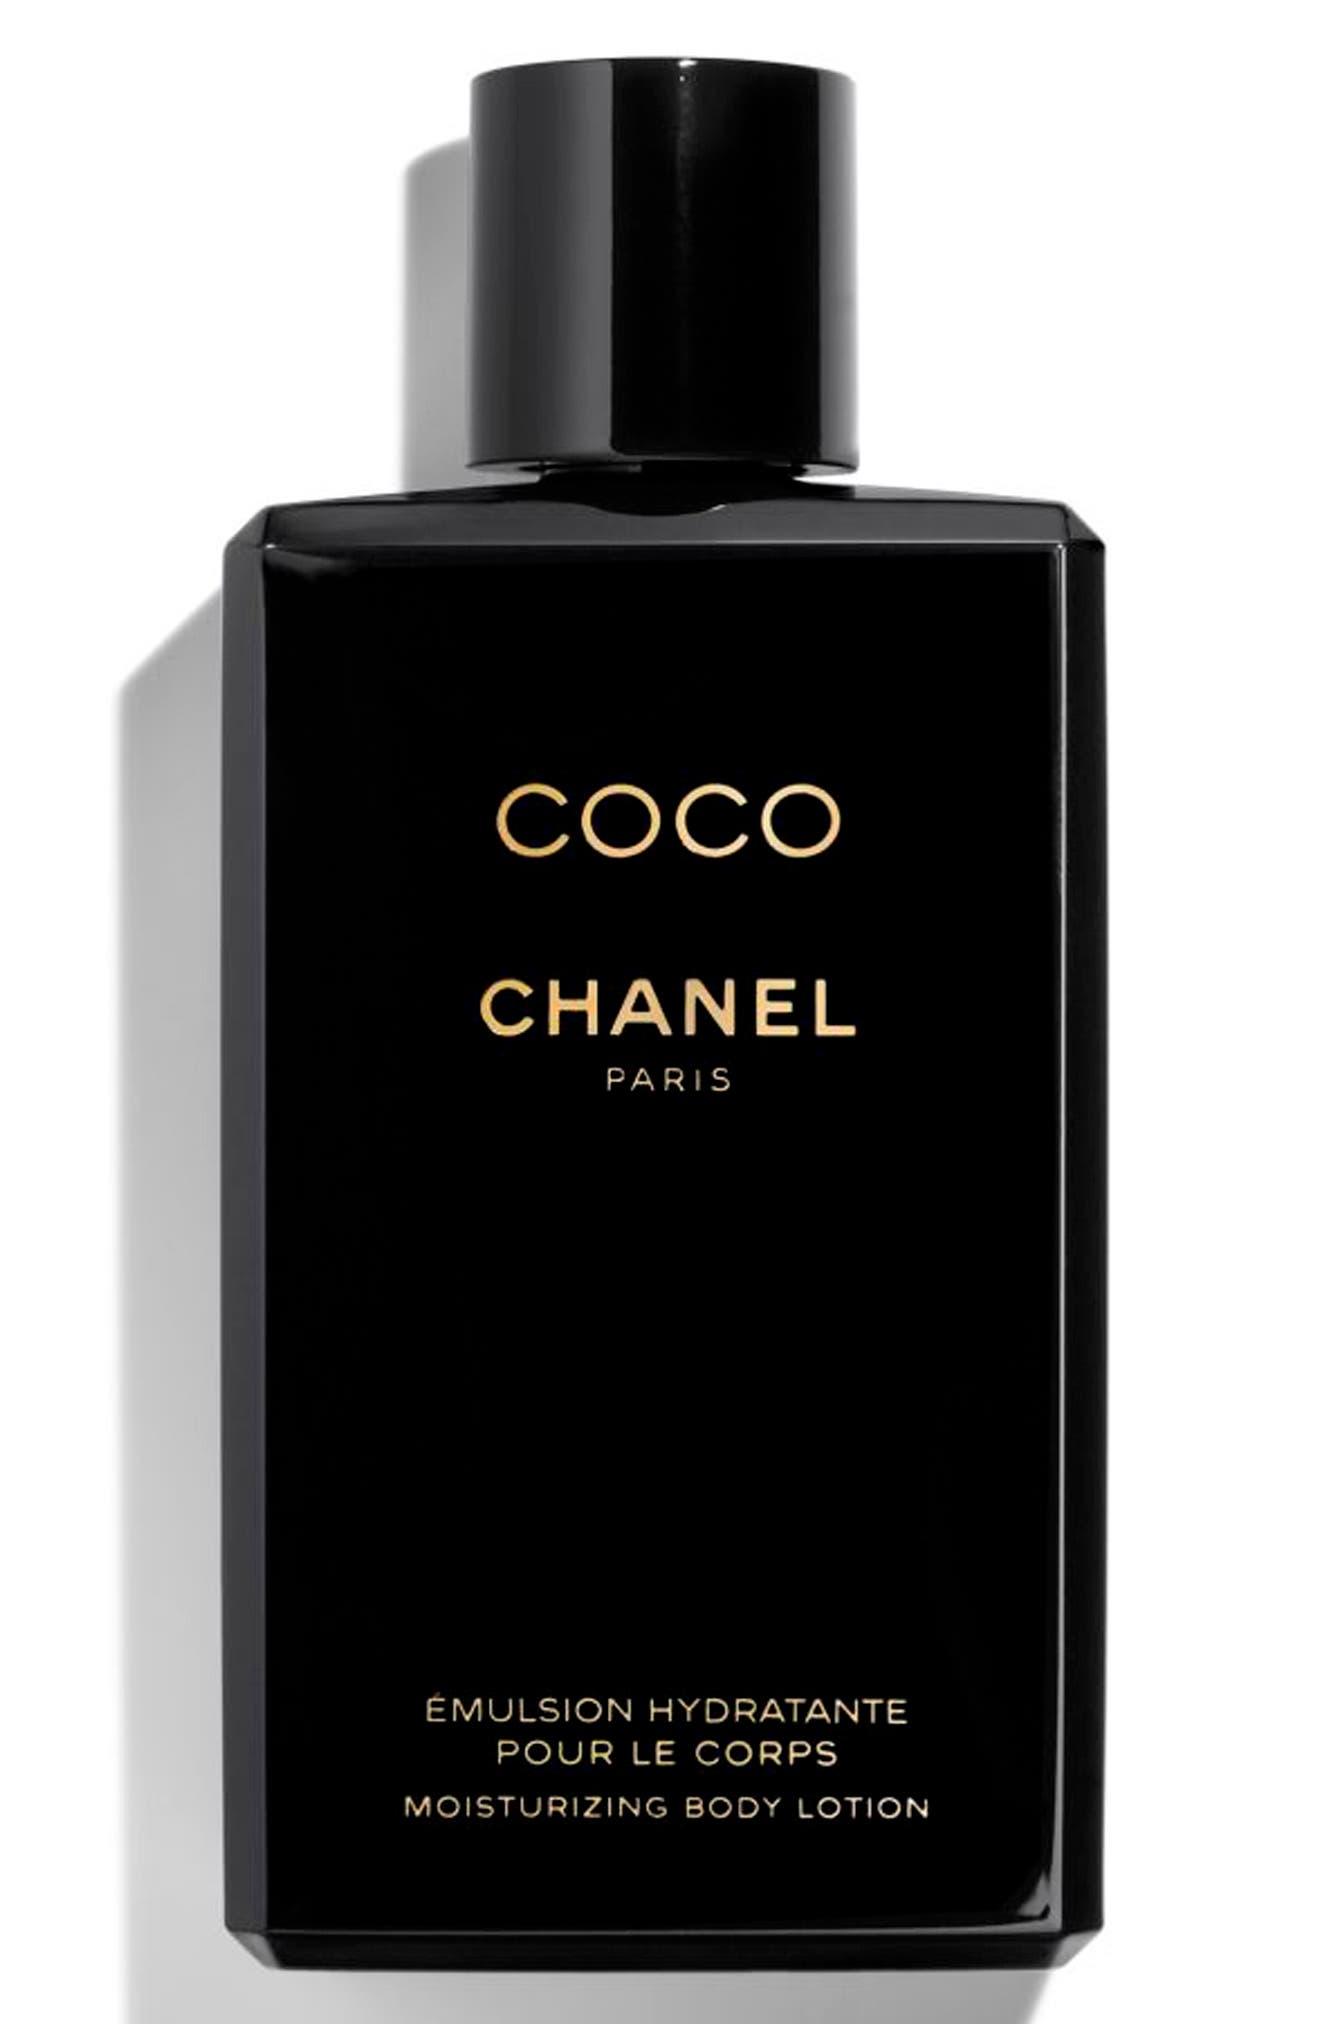 Chanel Body Bath Fragrances Nordstrom